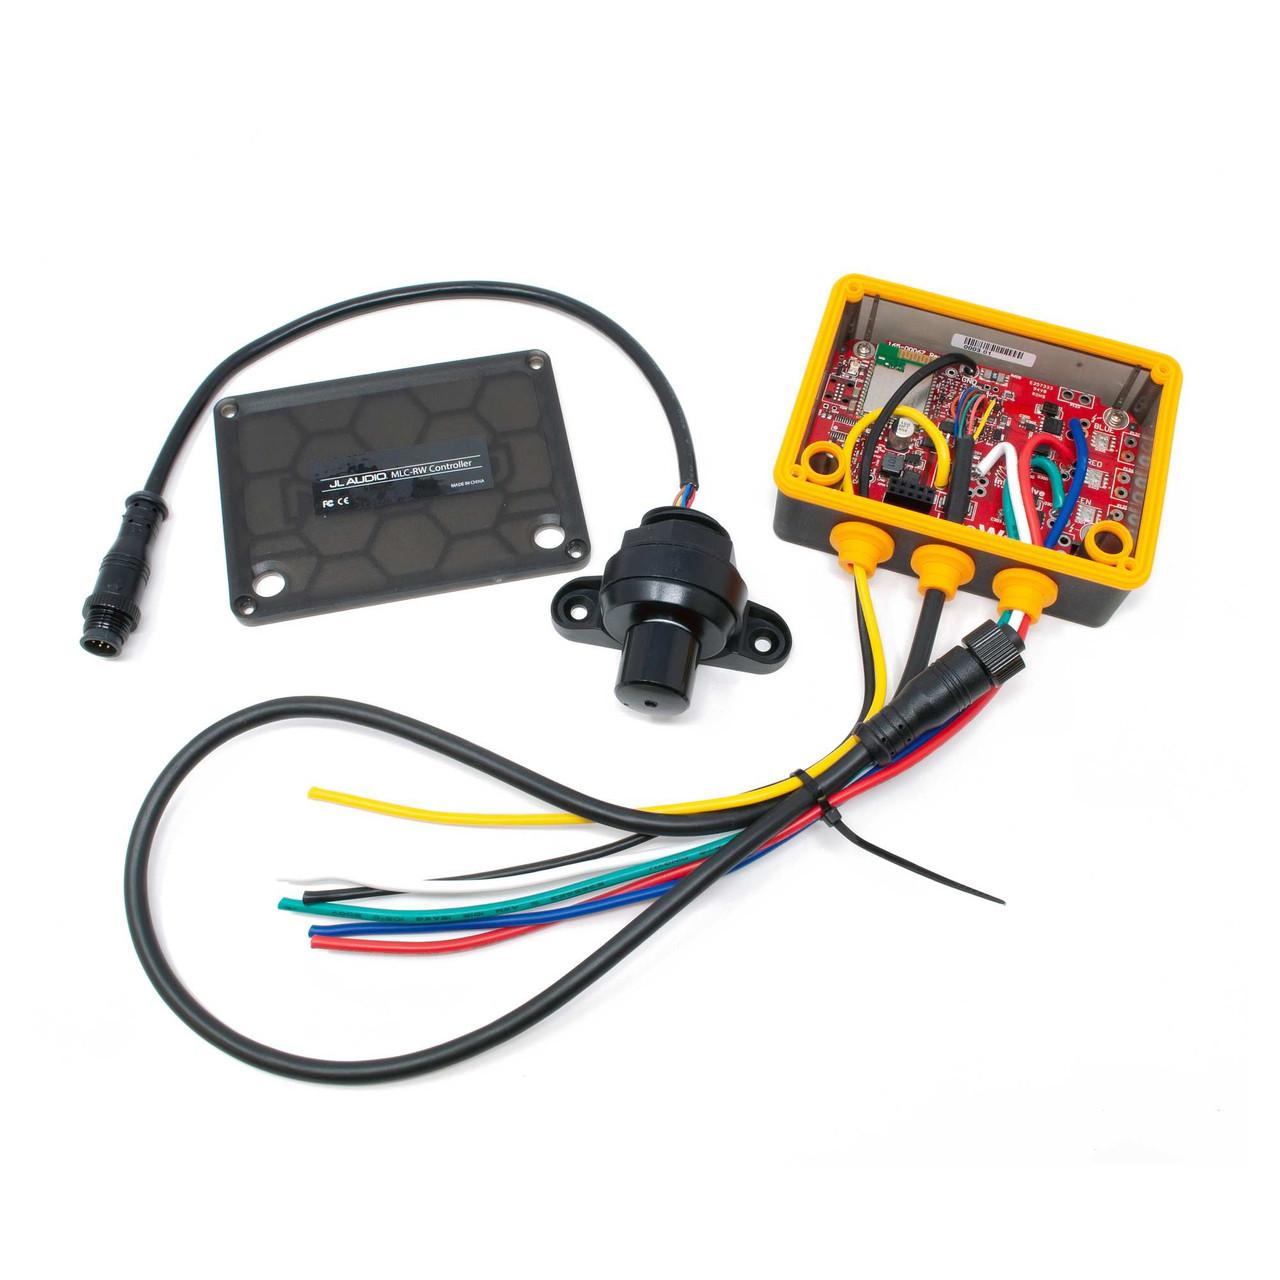 small resolution of  jl audio mlc rw marine led lighting controller with wifi